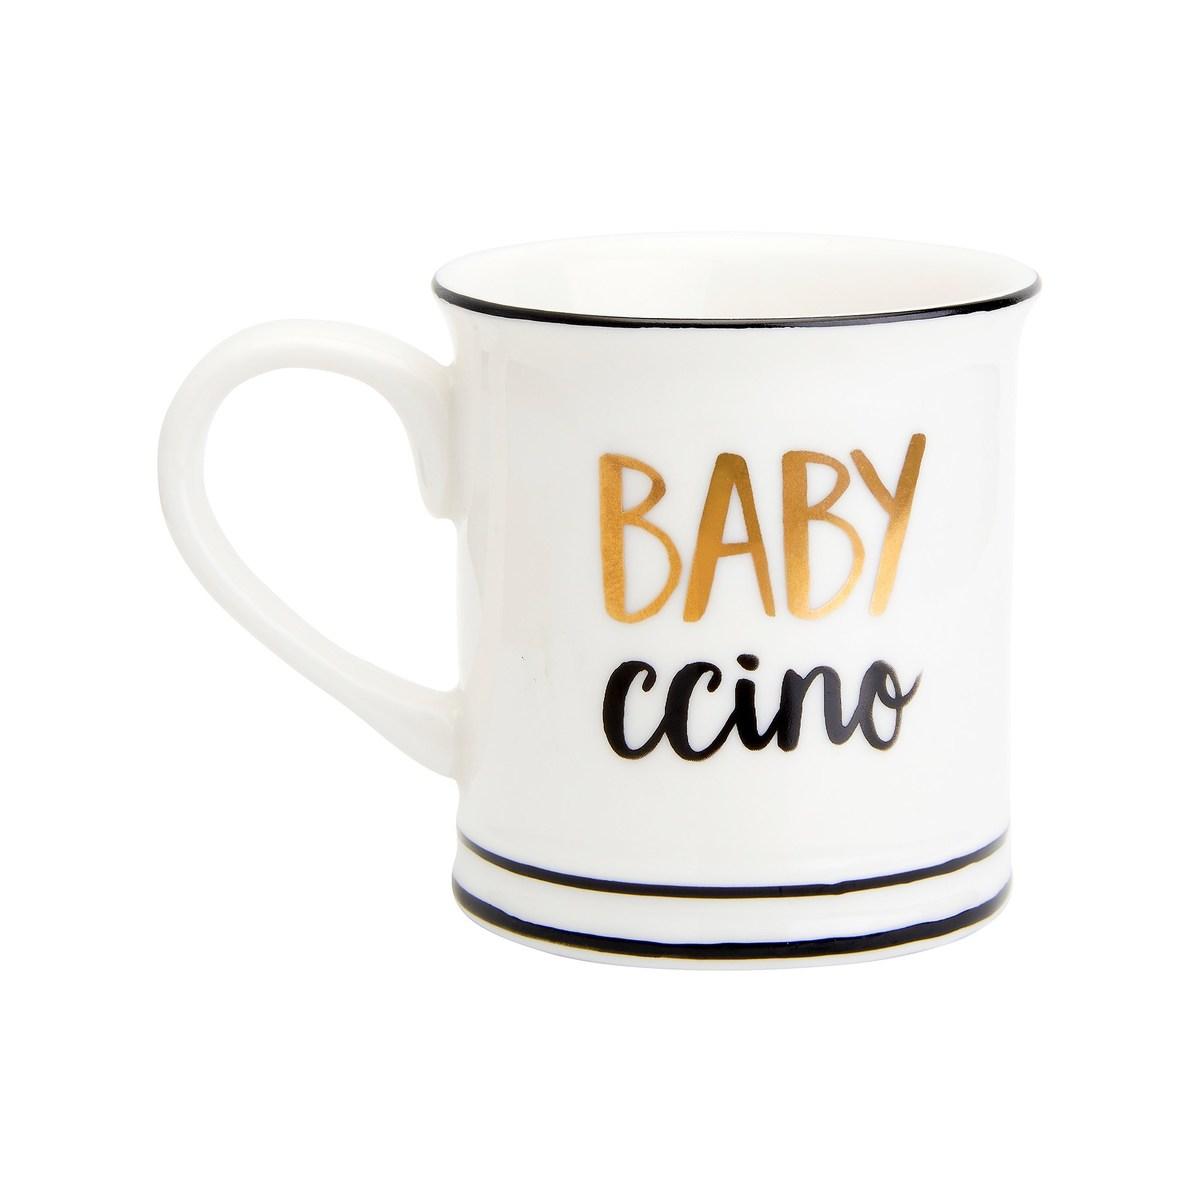 Hrnek  - BABYCCINO